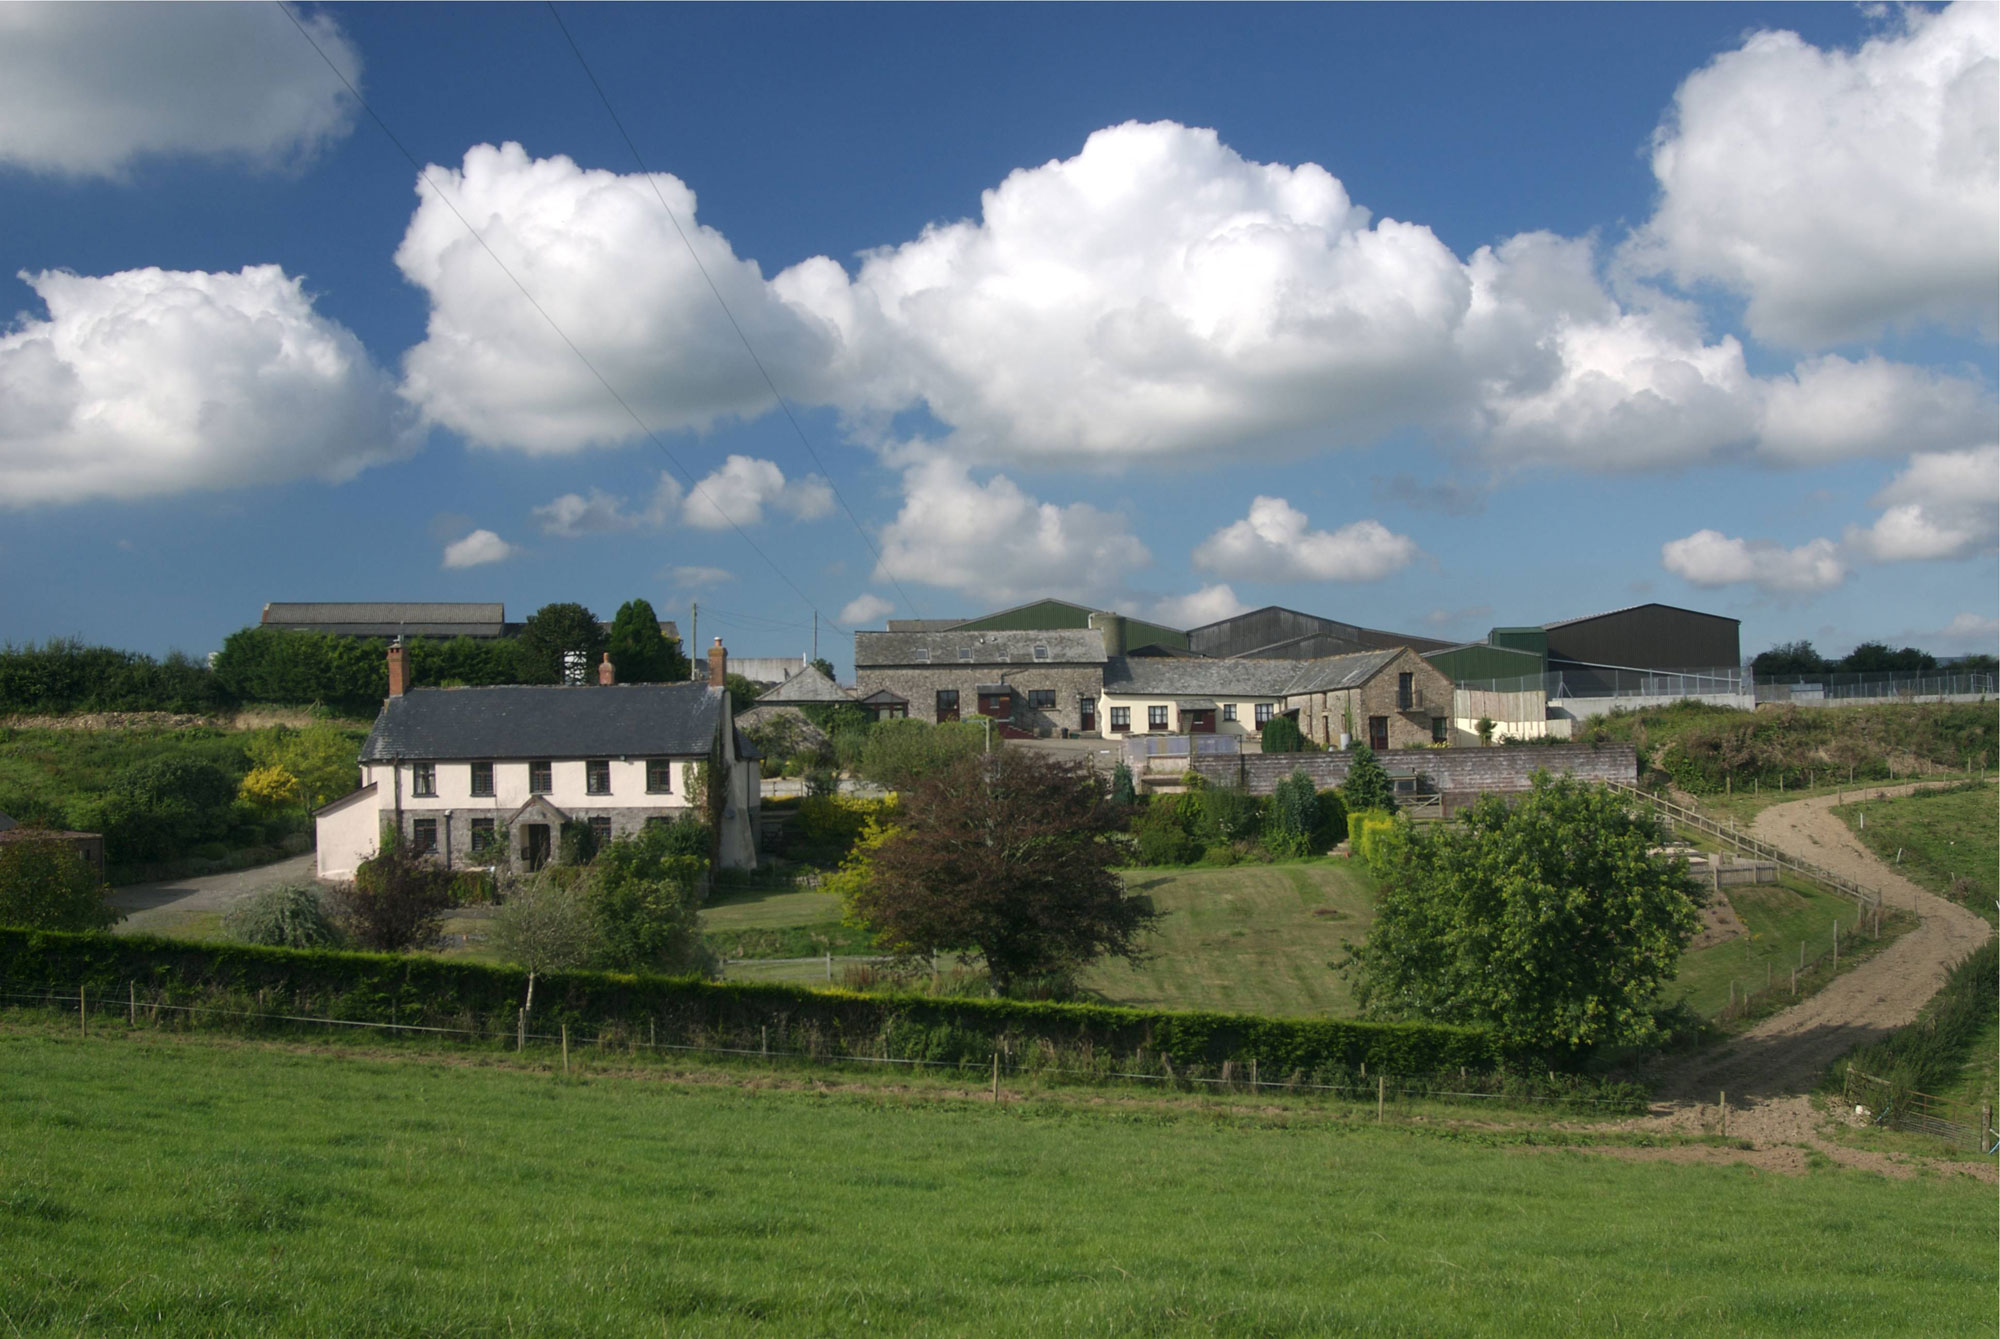 North Lee Farm